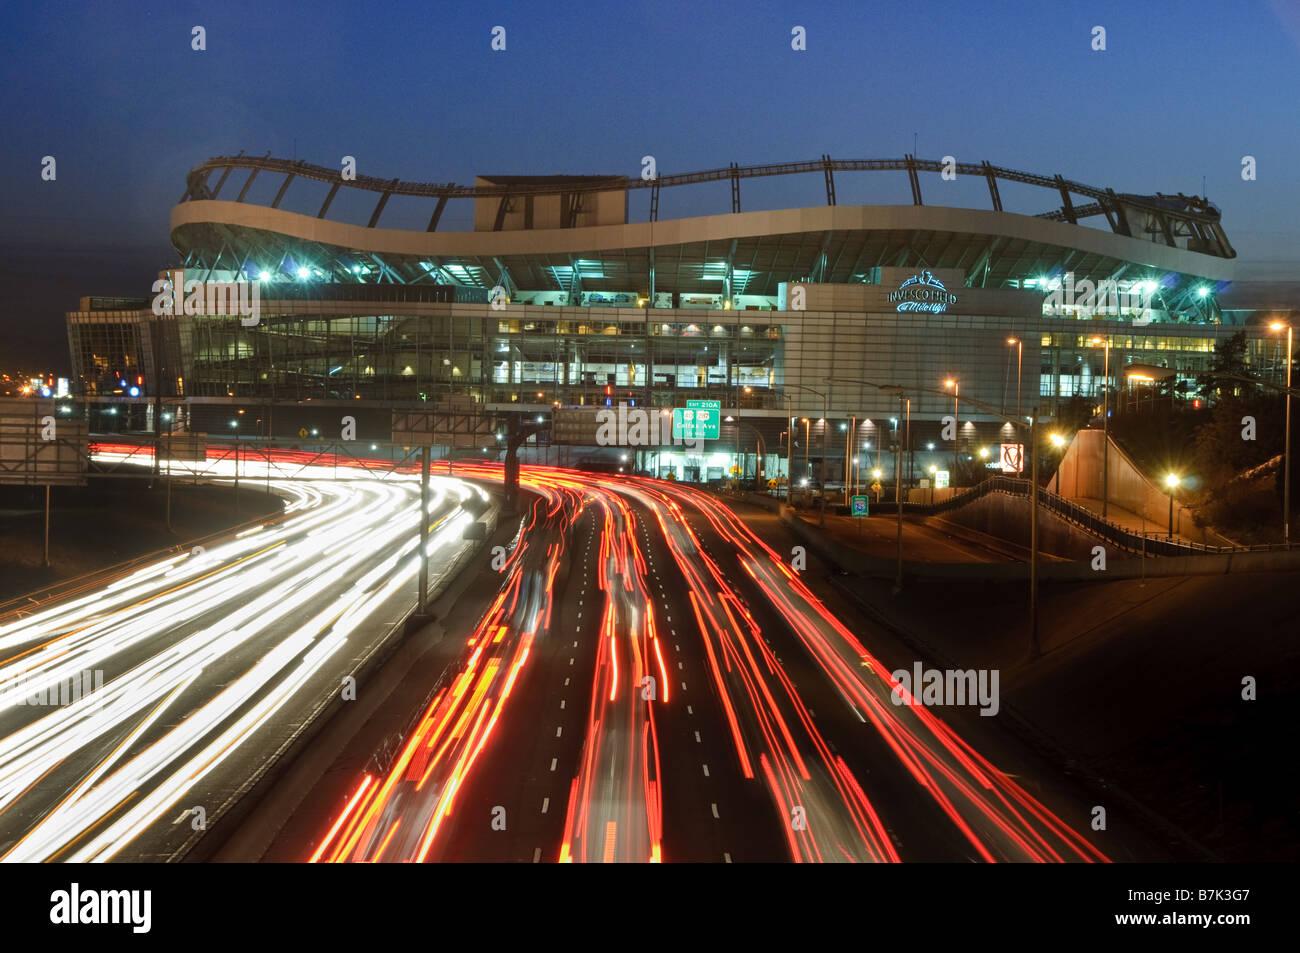 Invesco Stadium and I-25 - Stock Image